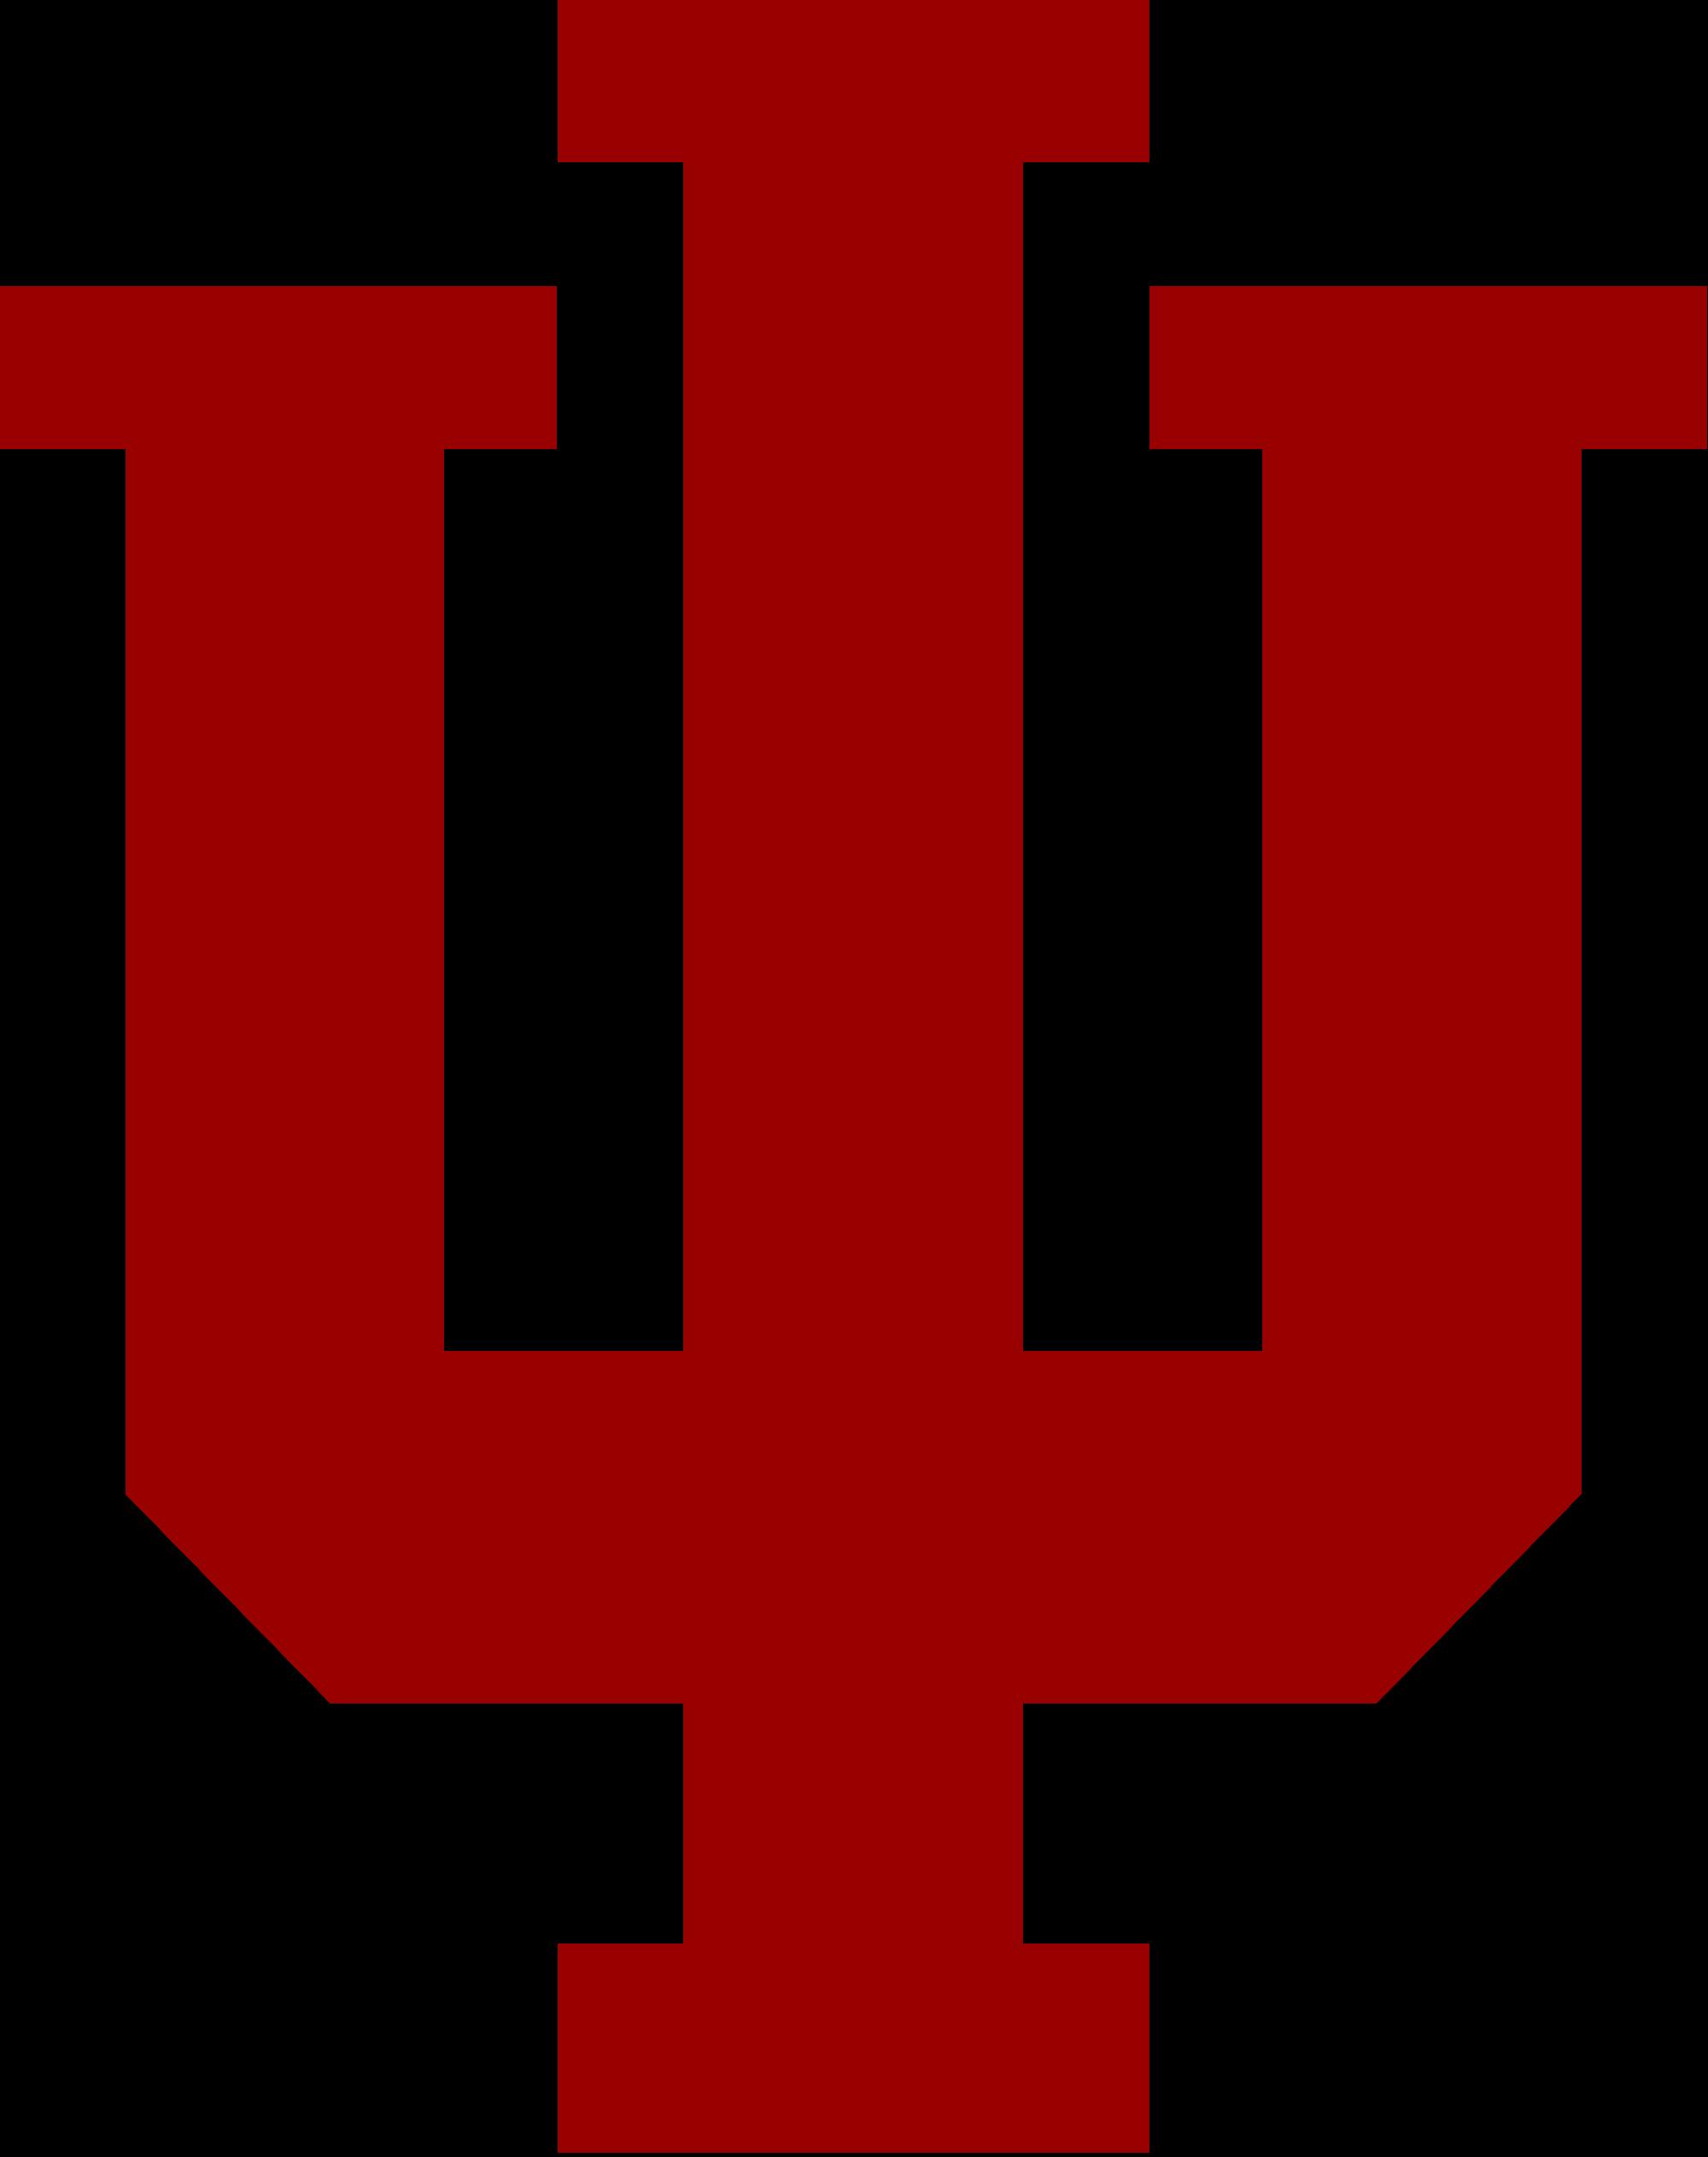 Big Ten Map Indiana Hoosiers Indiana Hoosiers Basketball Indiana University Bloomington